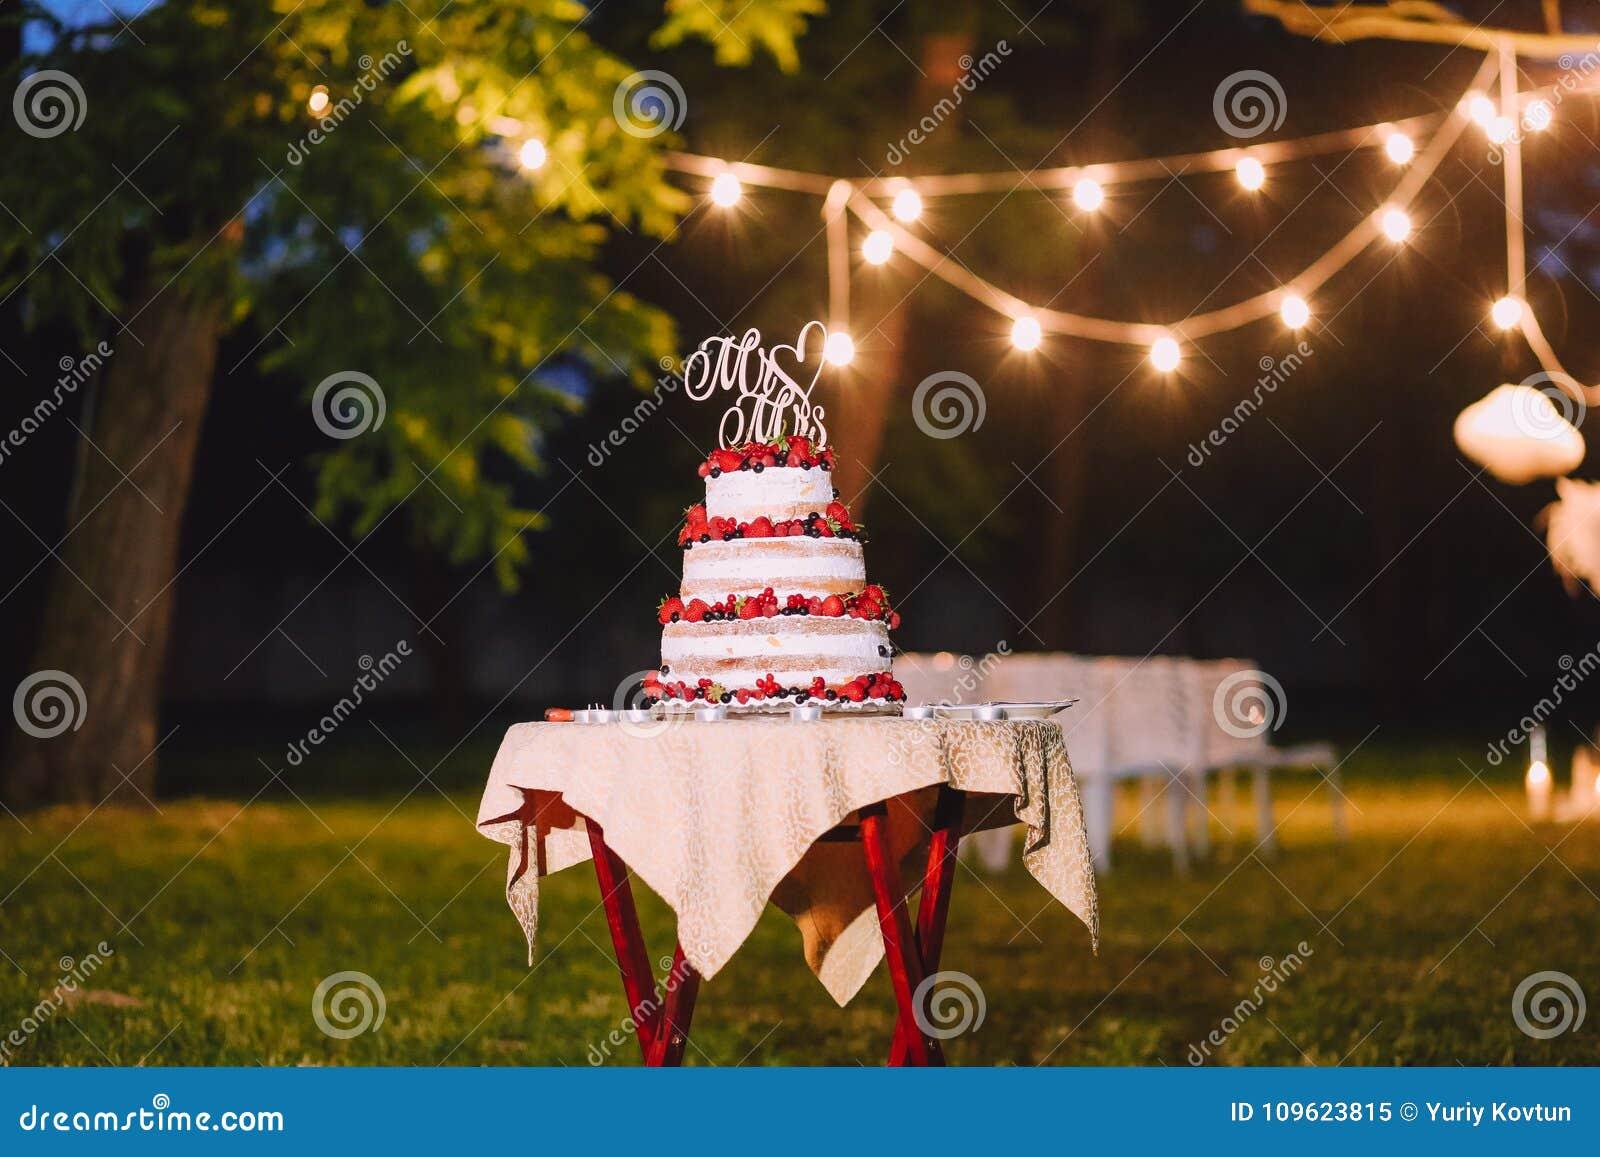 Wedding cake outside evening letters Mr Mrs